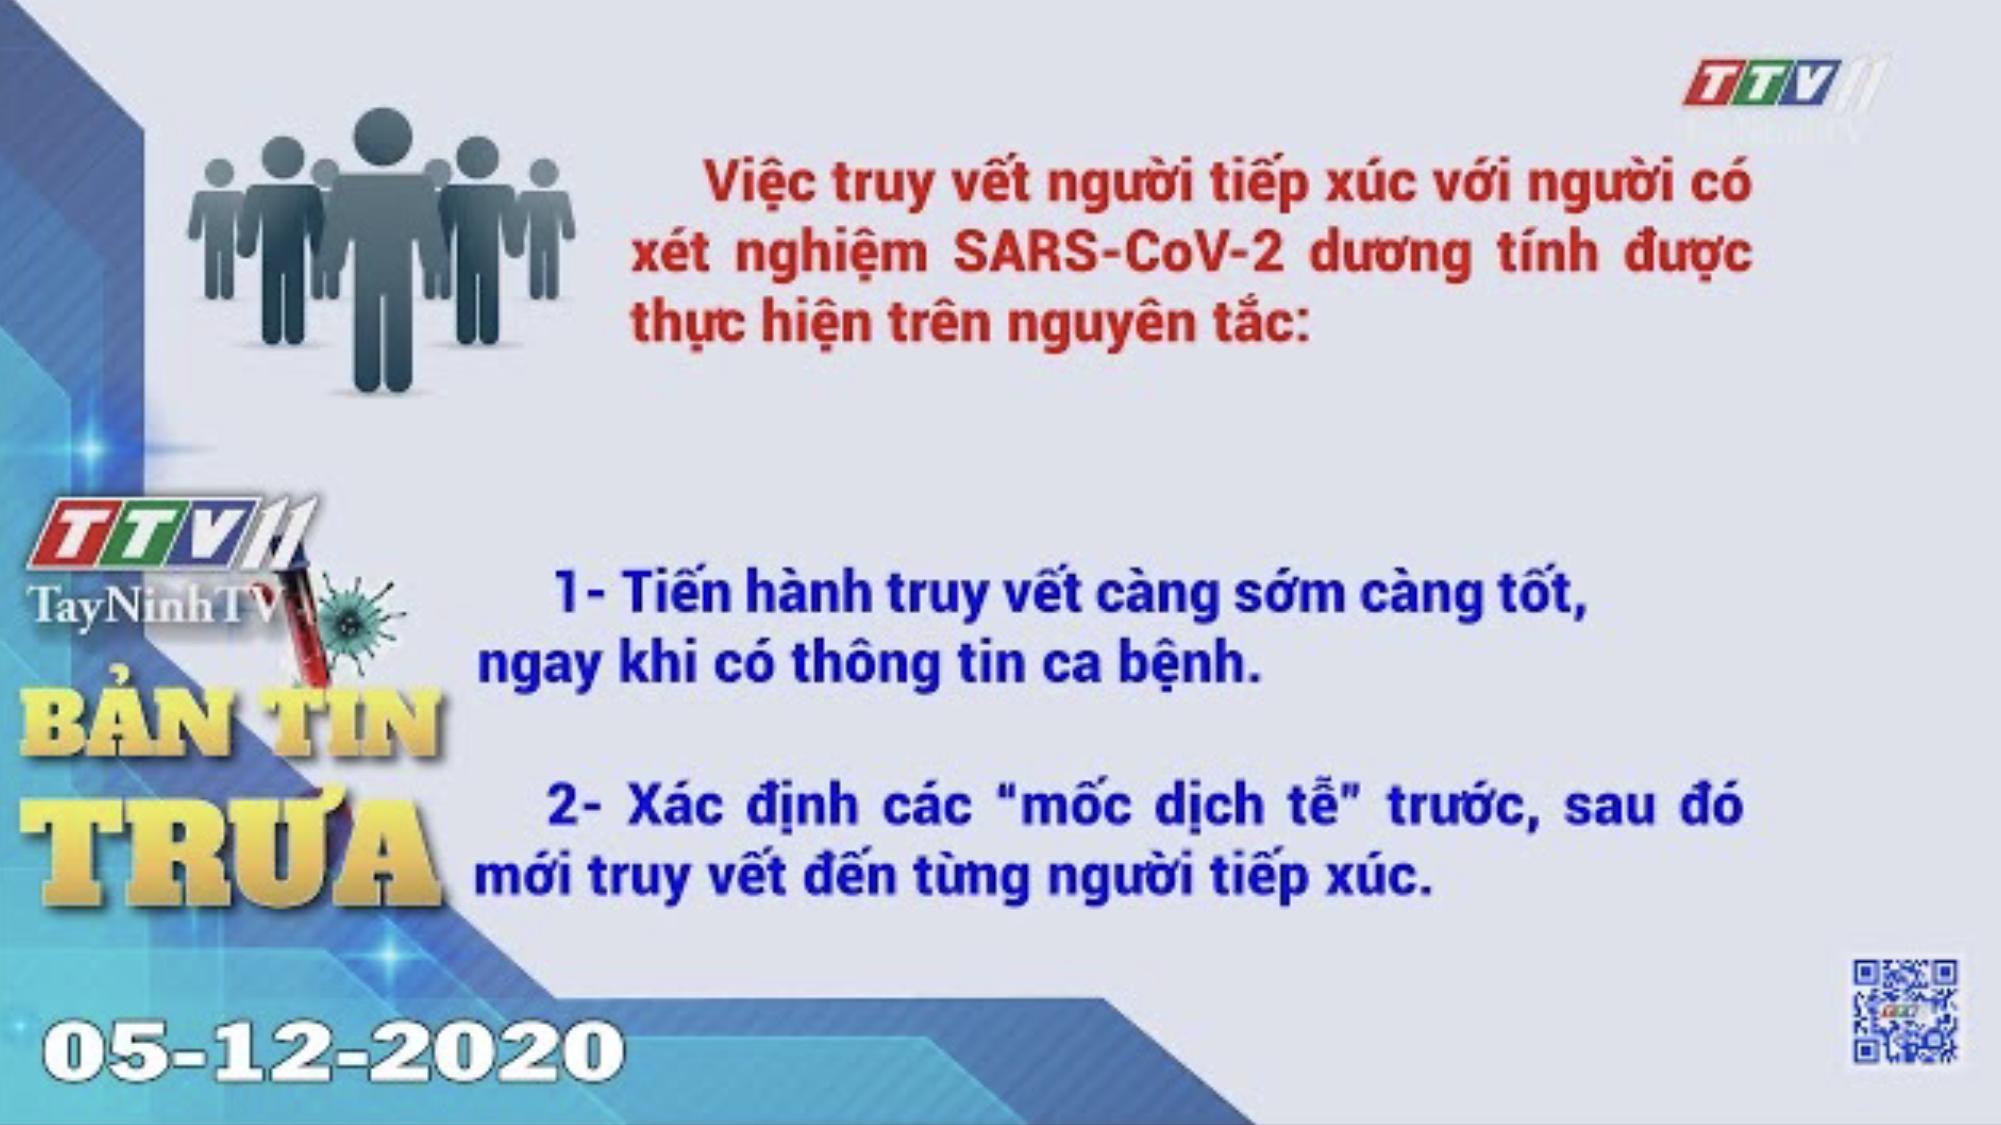 Bản tin trưa 05-12-2020 | Tin tức hôm nay | TayNinhTV